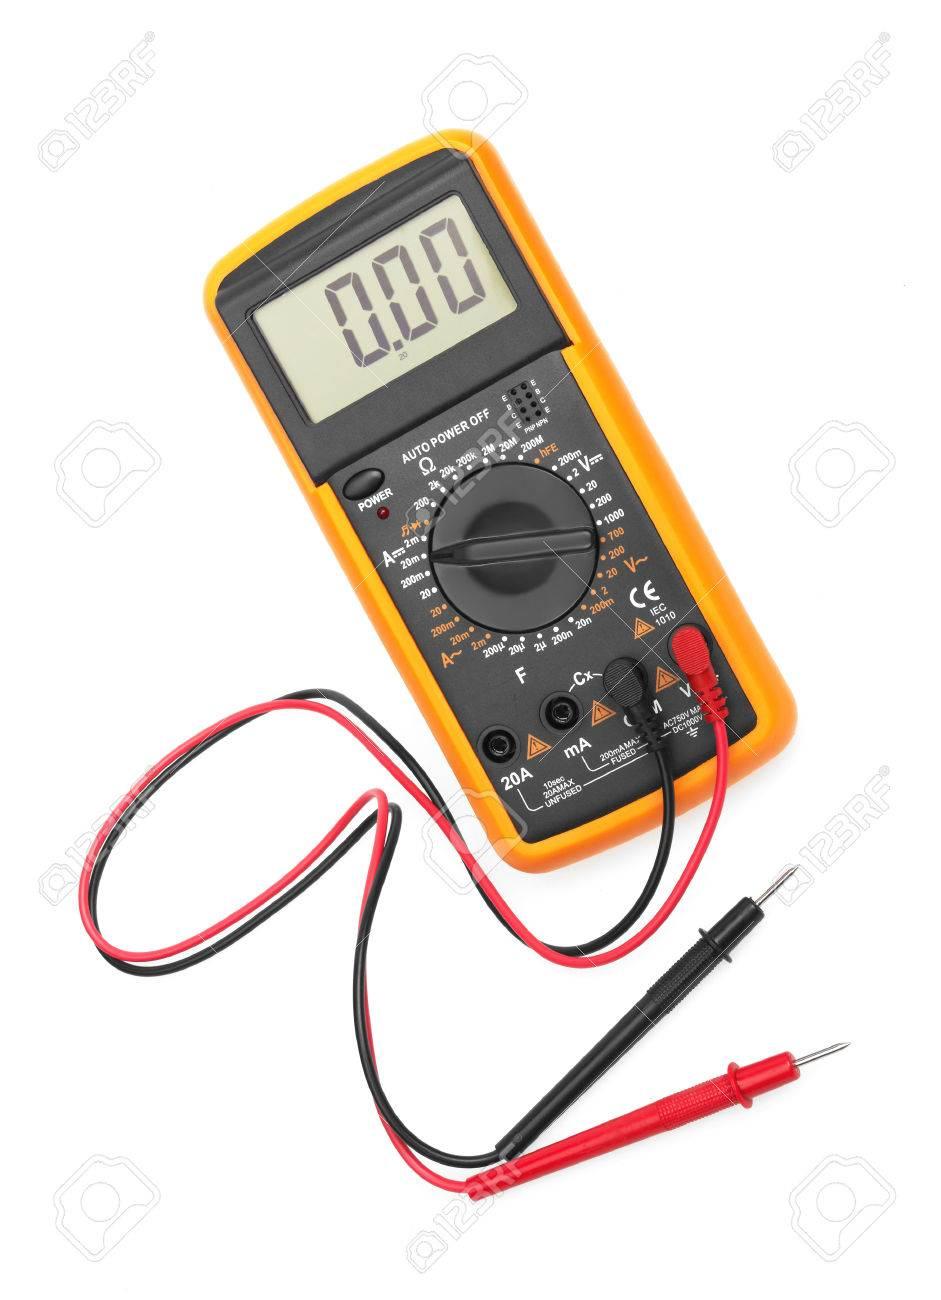 Digital multimeter isolated on white background - 26476628